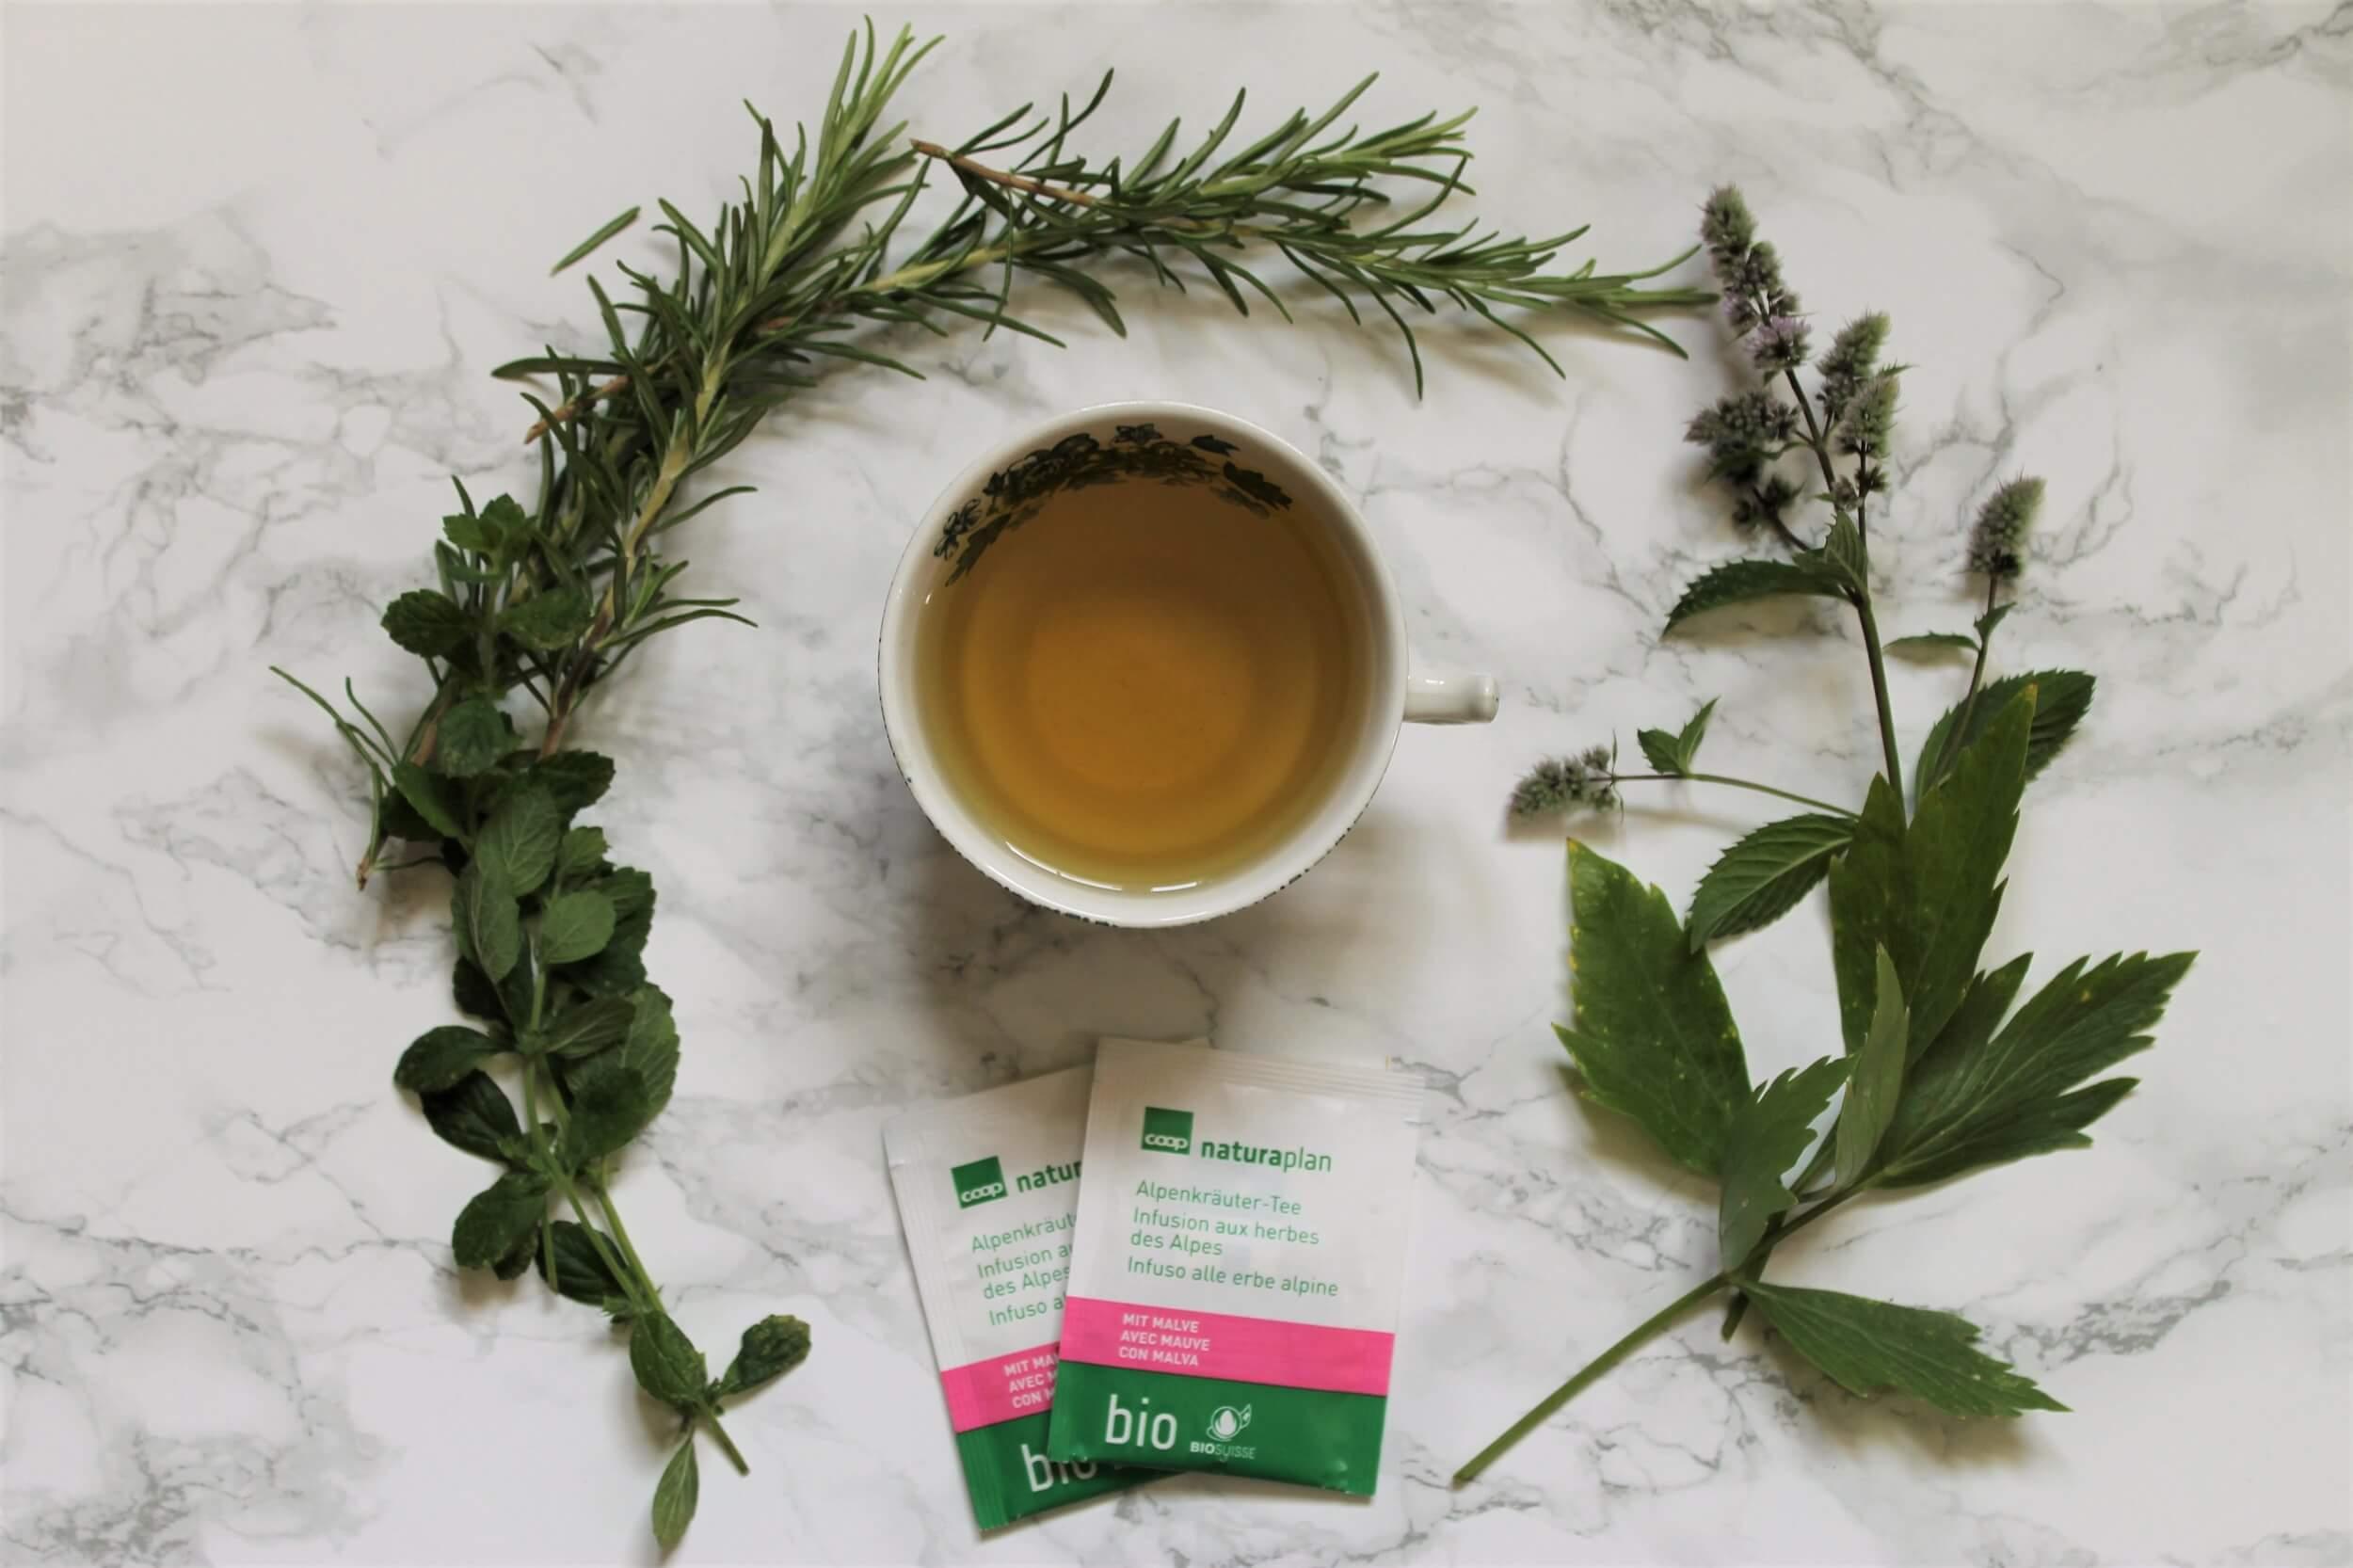 Naturaplan Organic Alpine Herbal Tea with Mallow Review